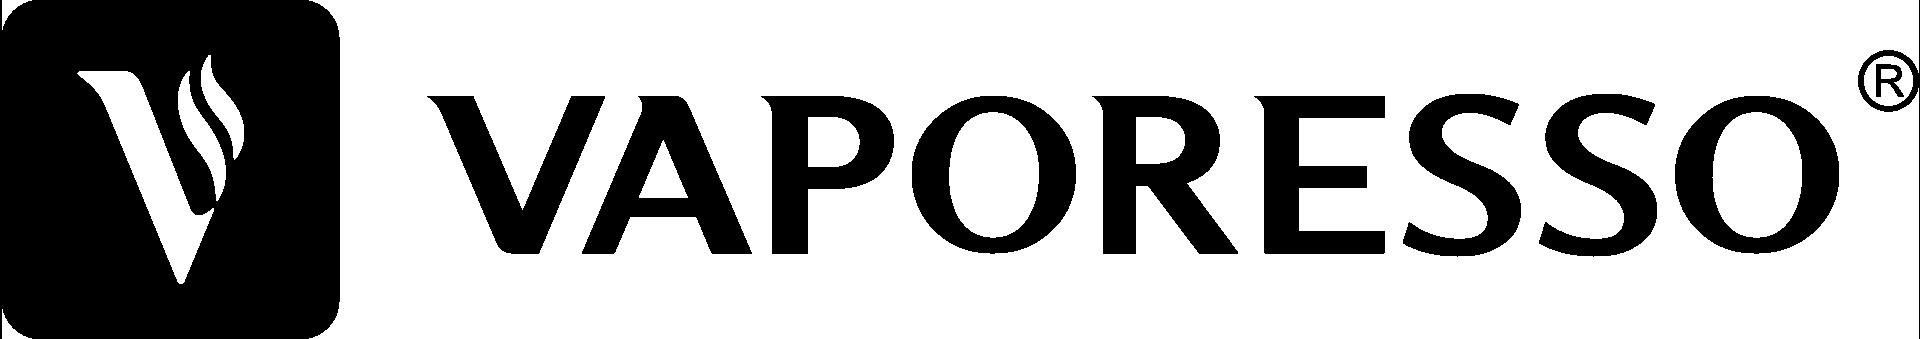 vaporeso_logo_R-black.png